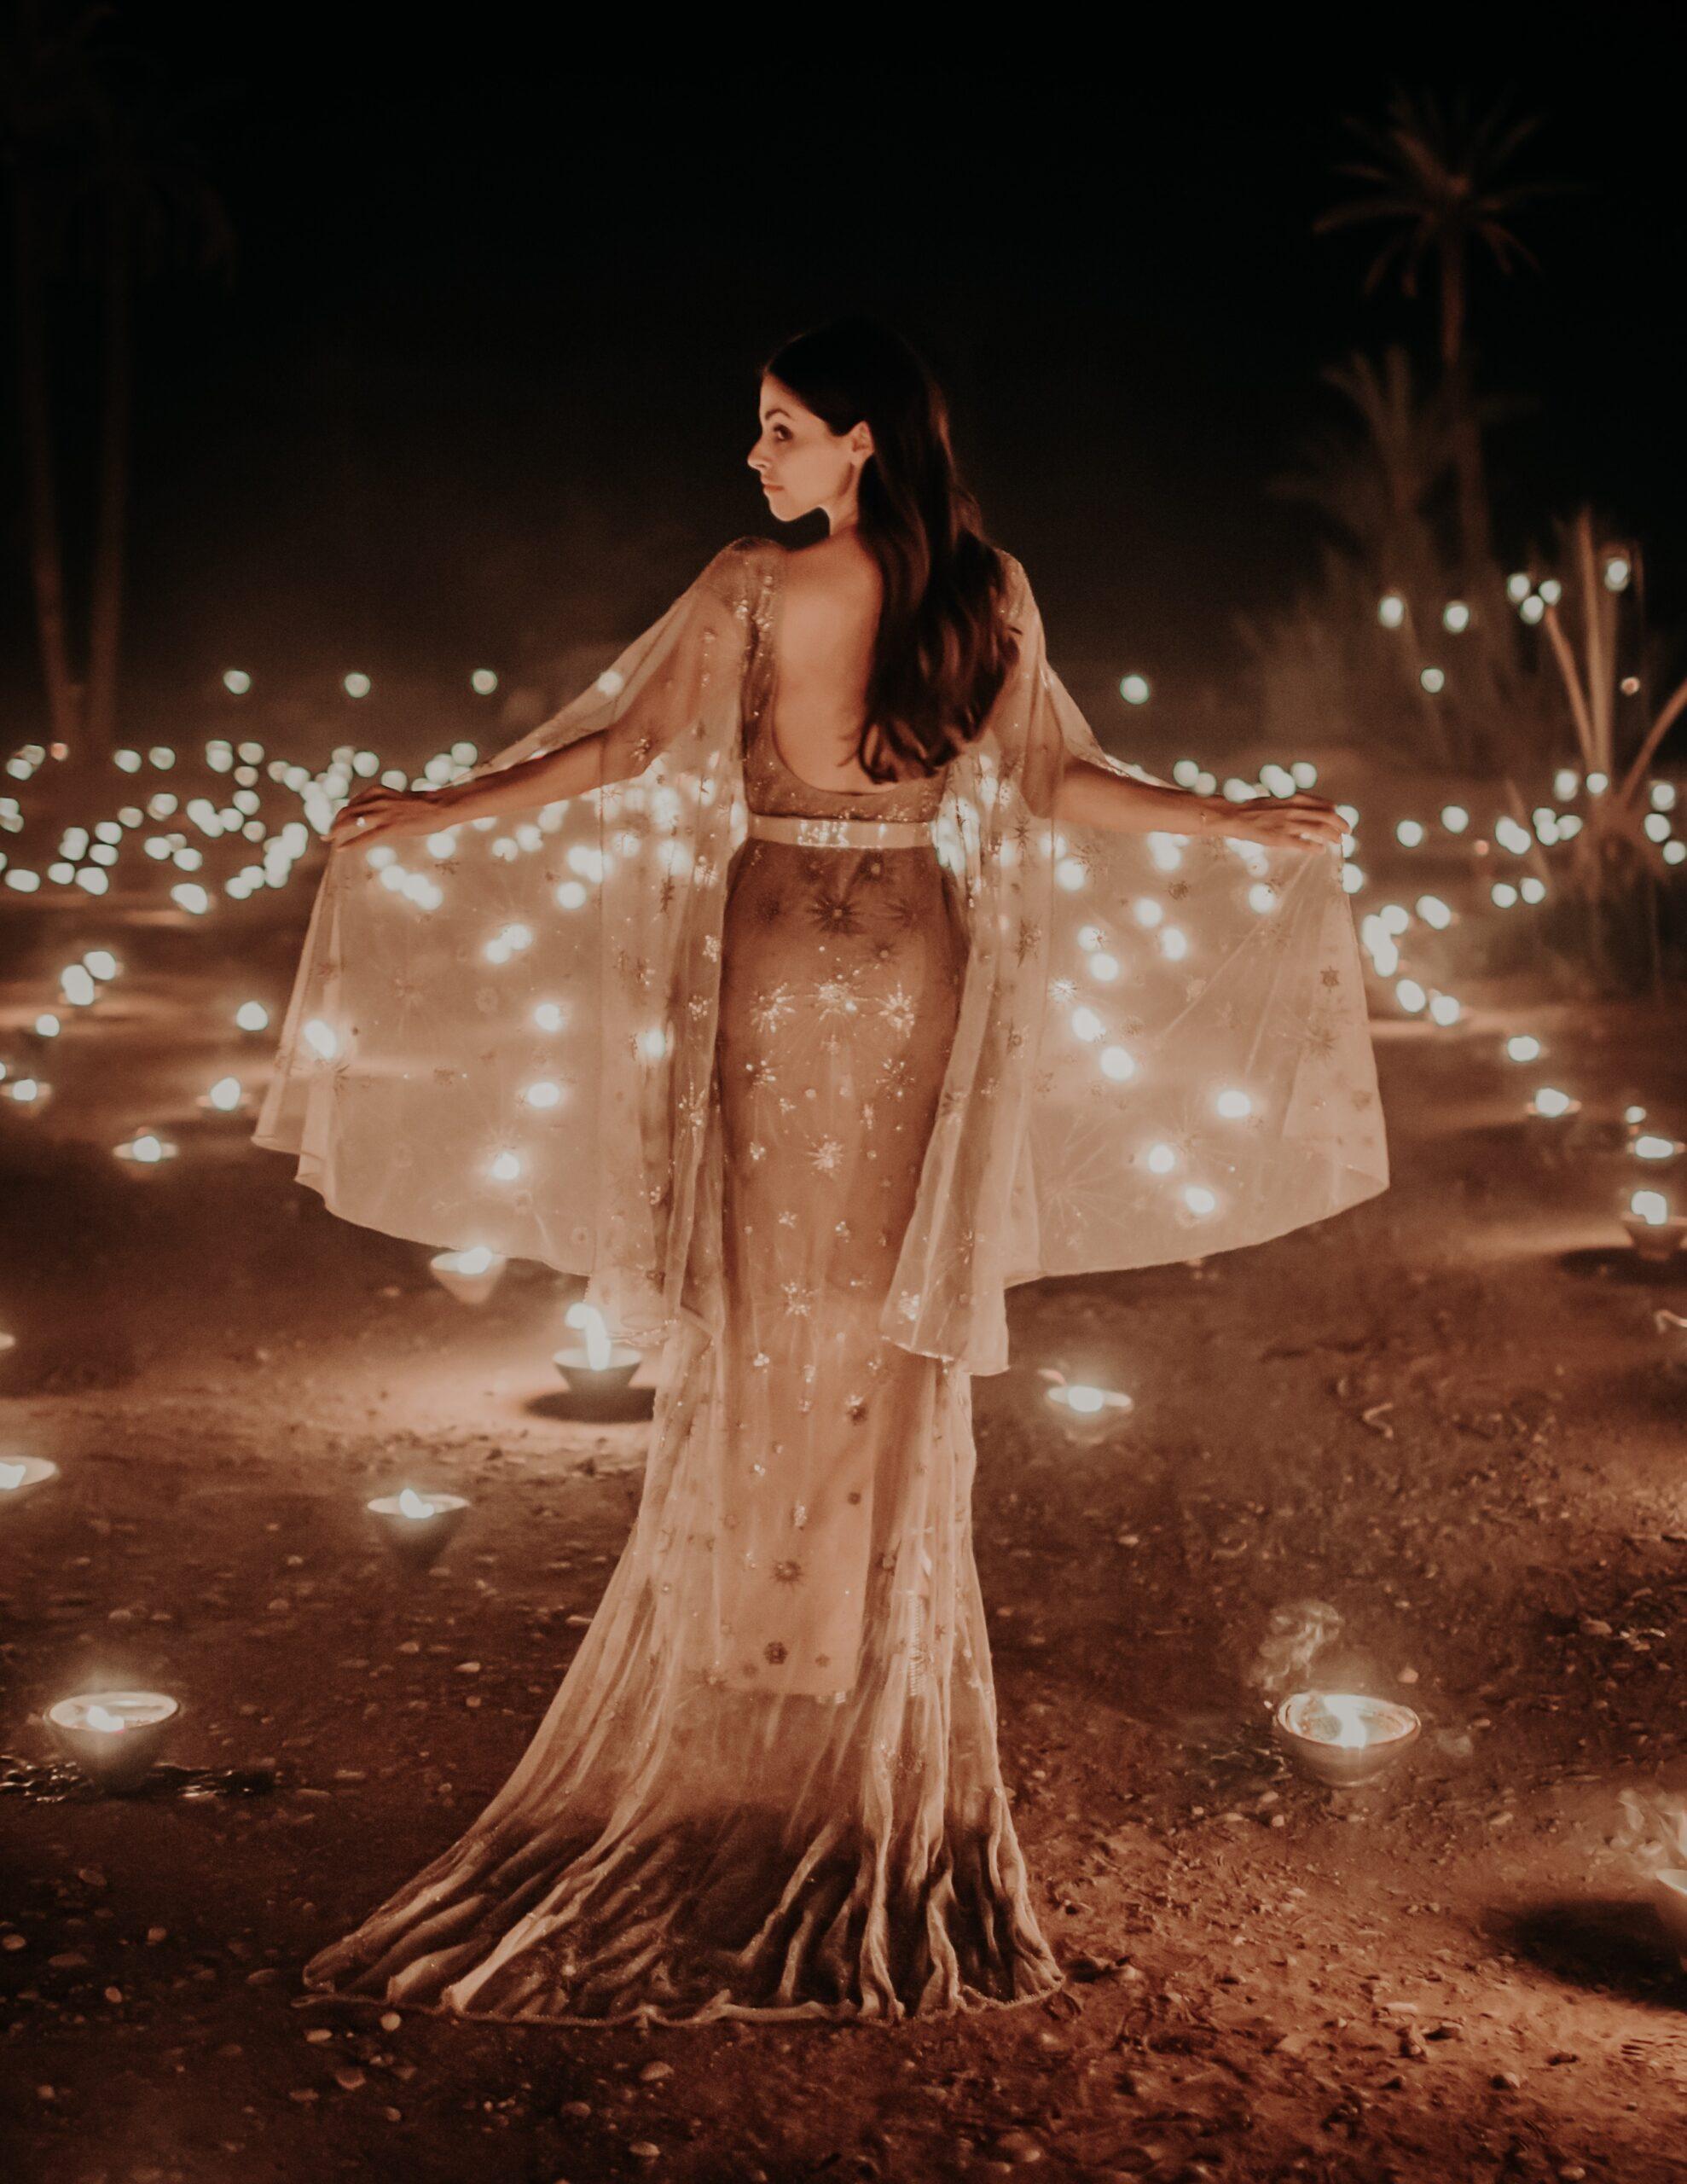 The Love Hunters - a bride in the Moroccan desert